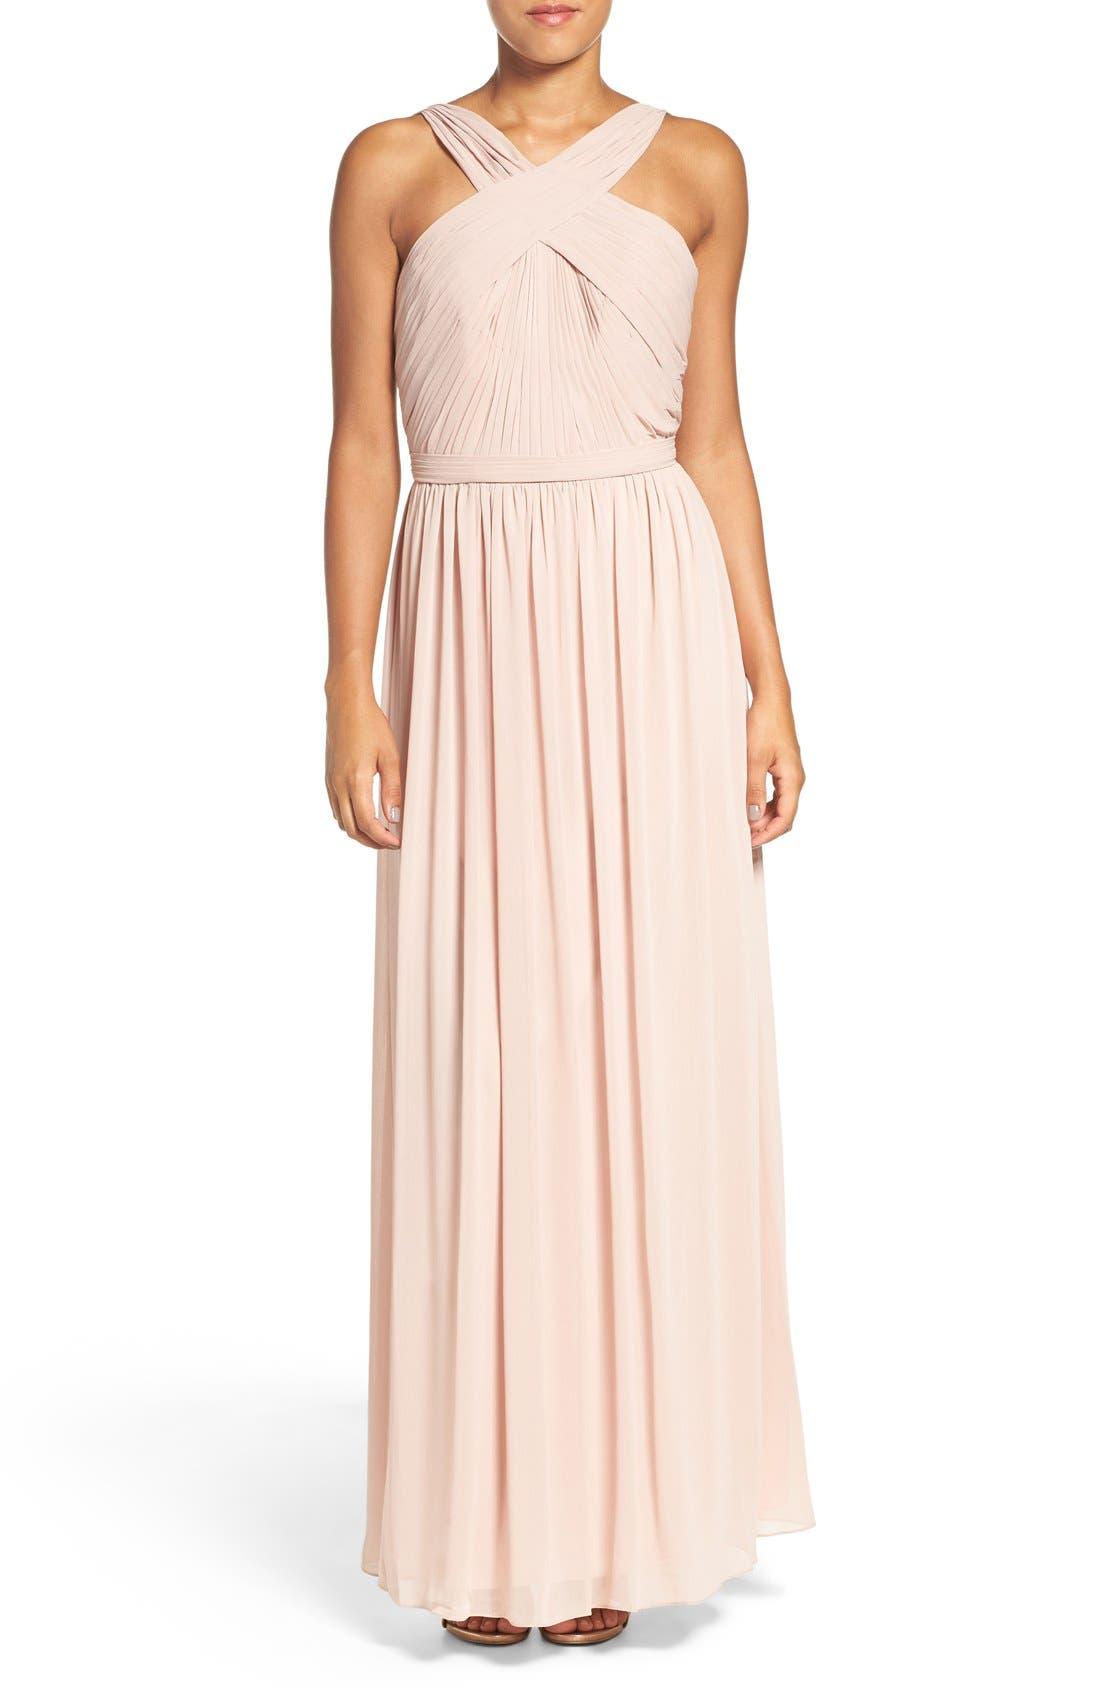 'Micah' Crisscross Neck A-Line Chiffon Gown,                         Main,                         color, Buff